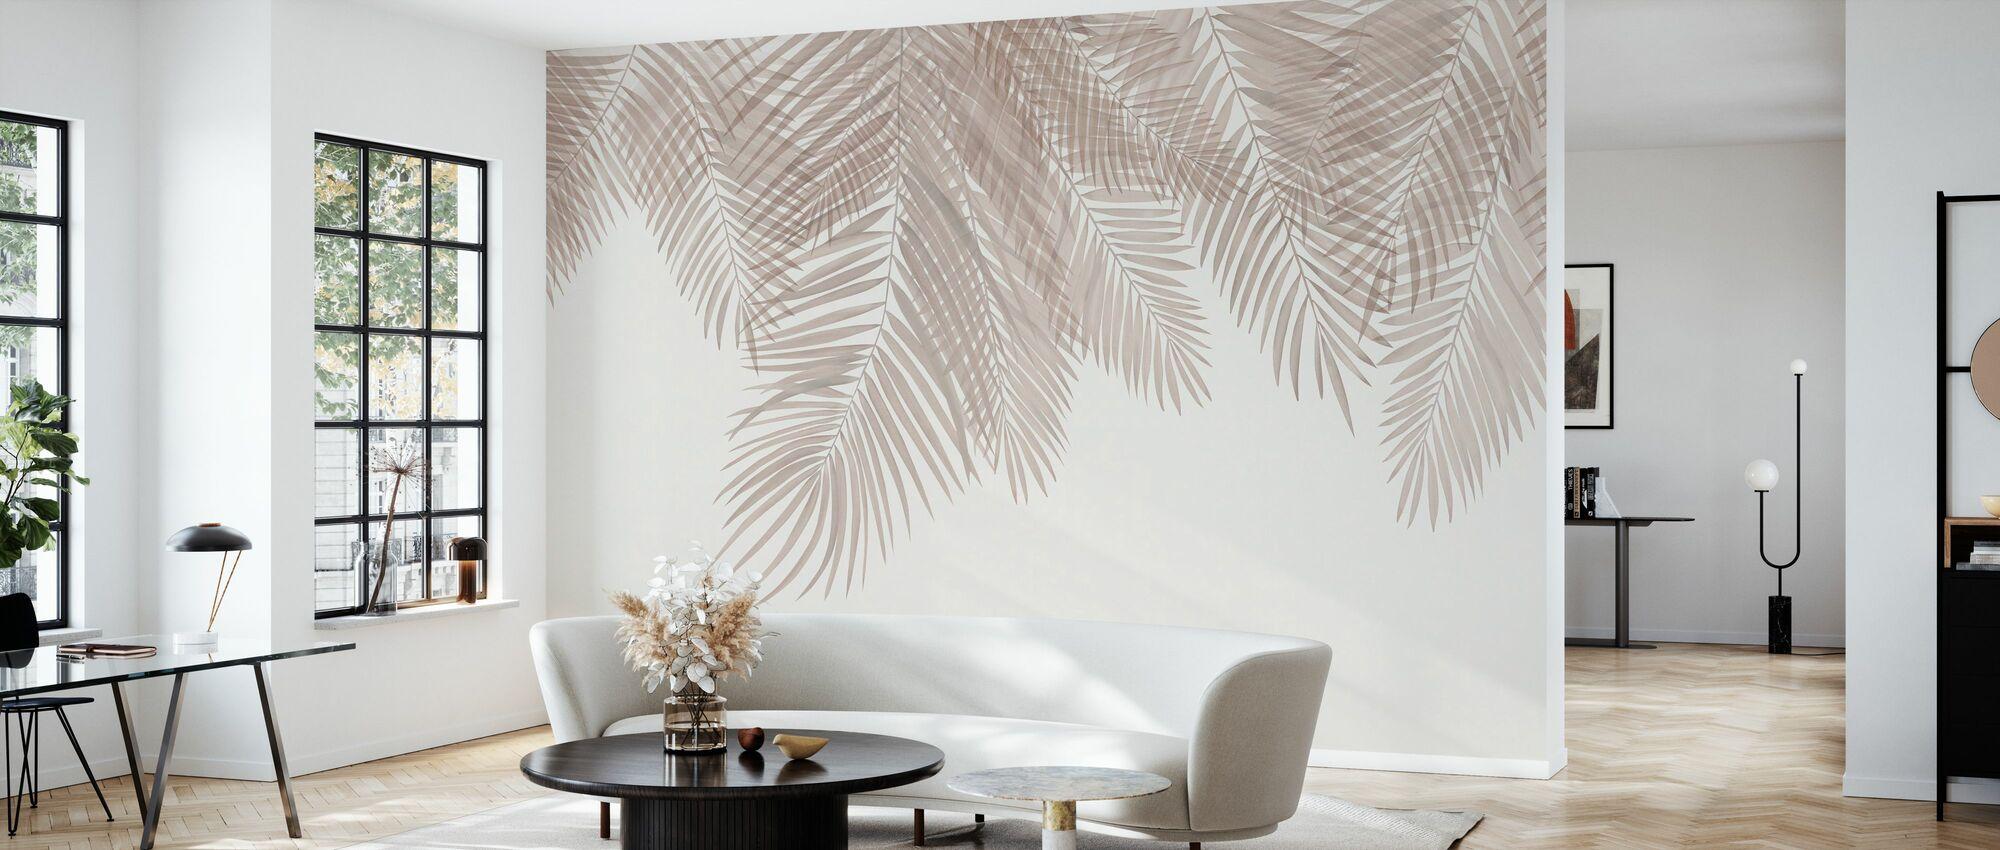 Hanging Palm Leaves - Sepia - Wallpaper - Living Room